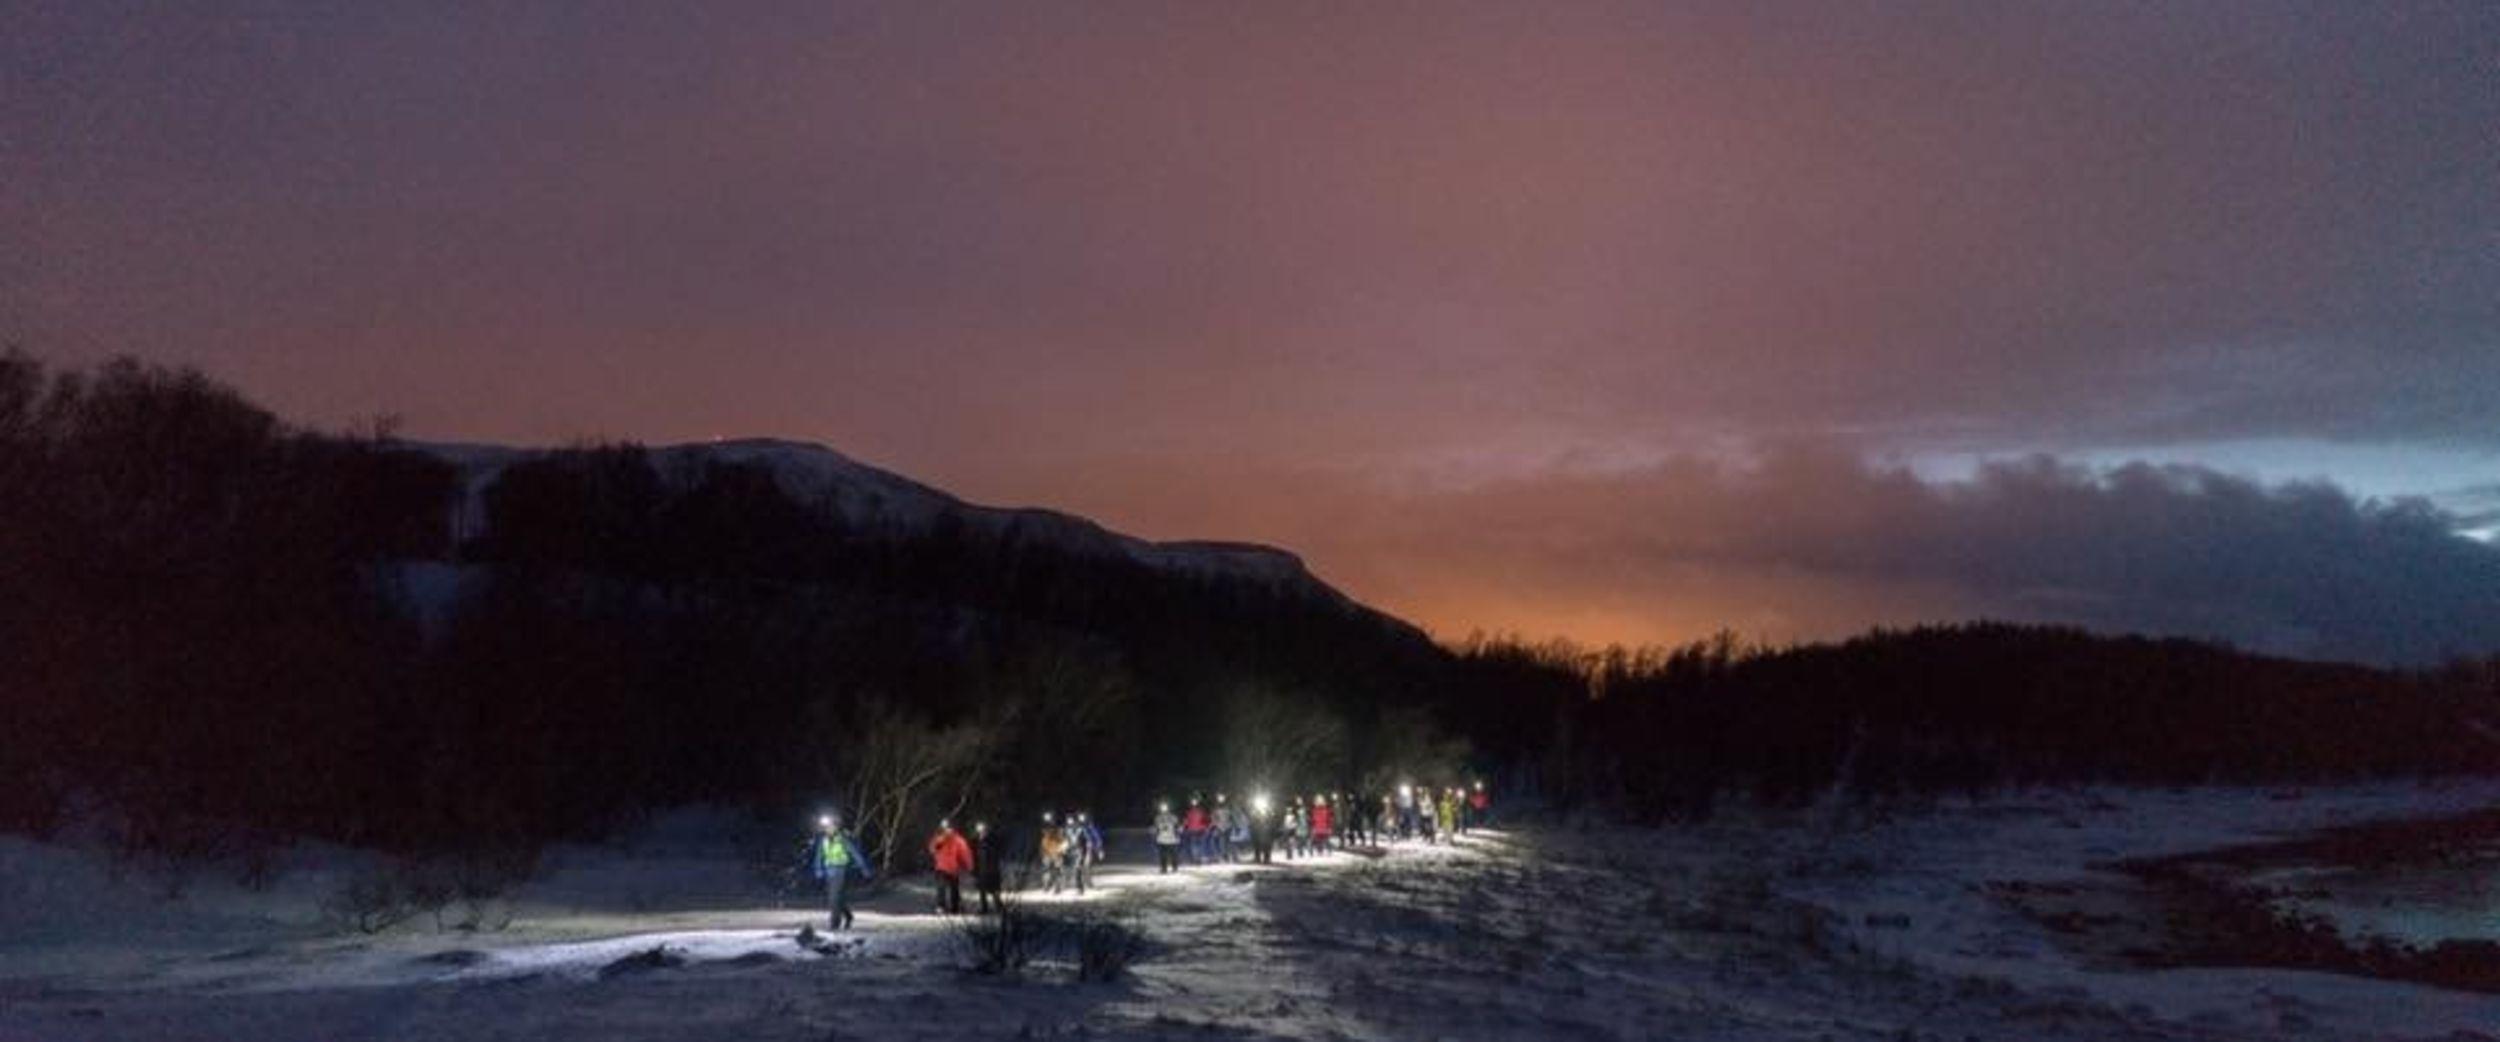 Coastal walk in the dark on a winter day. Photo: Meike Zylmann